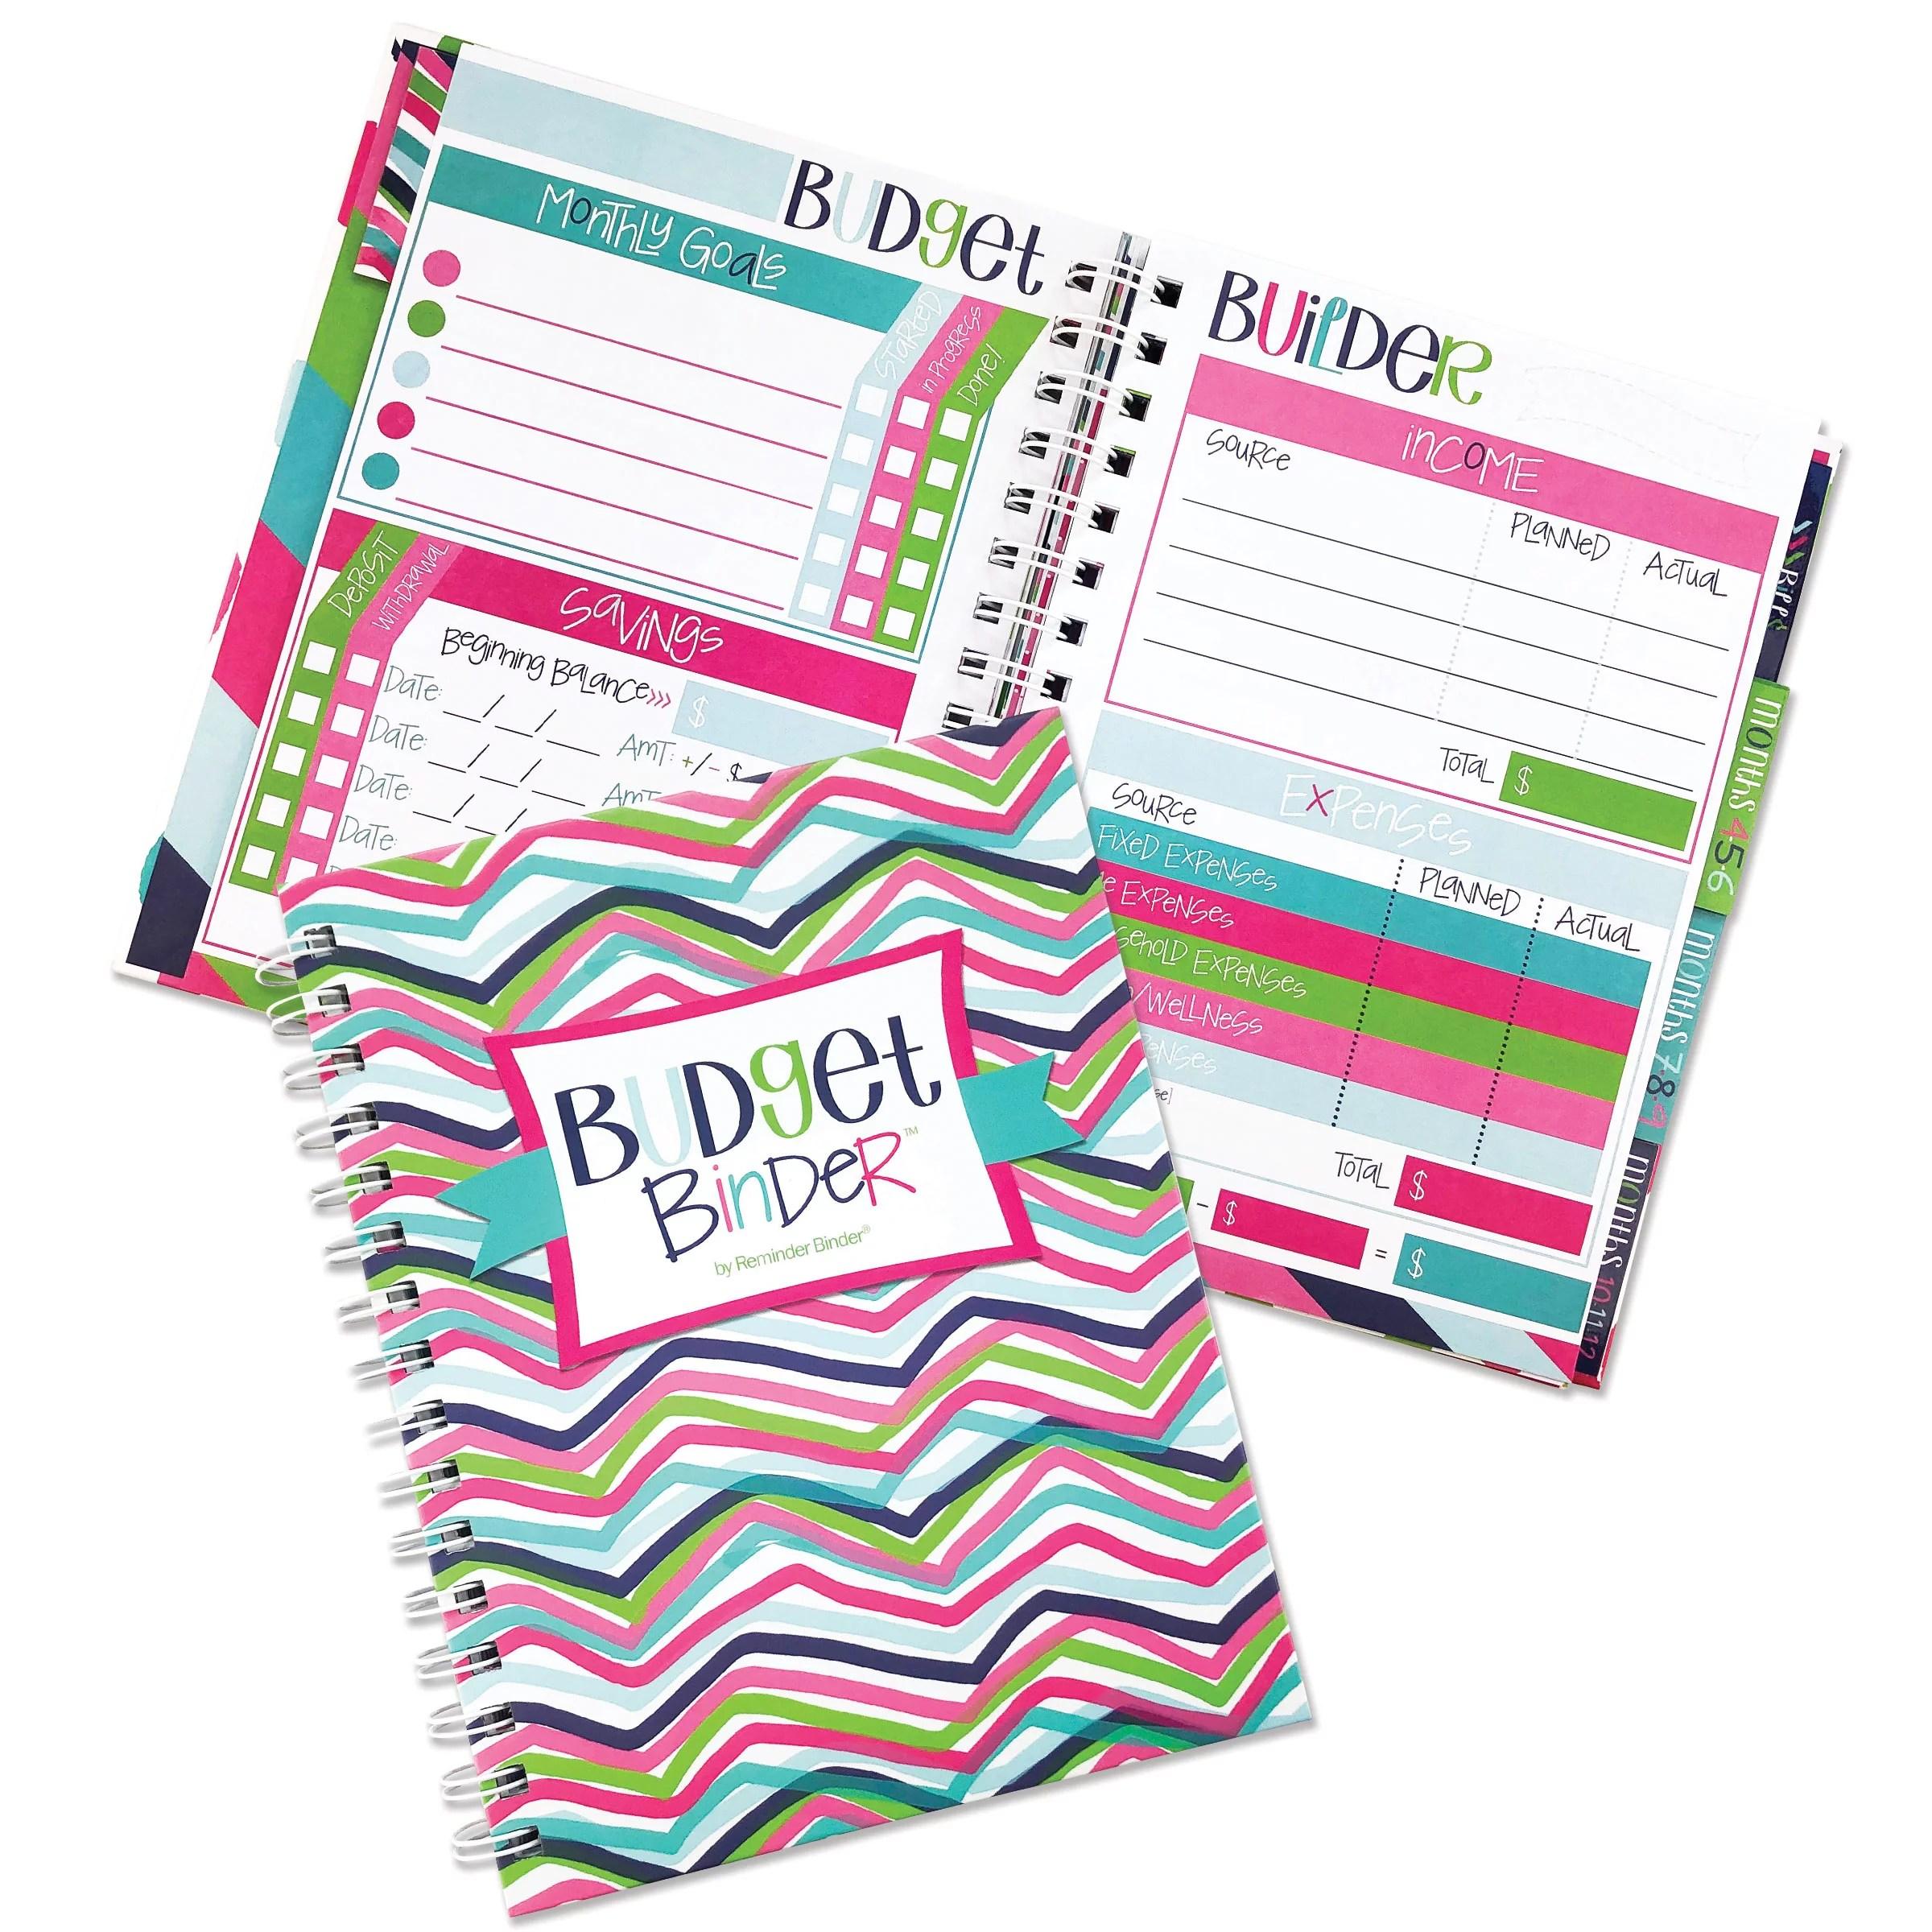 12 Month Budget Planner Bill Tracker Organizer W Calendar